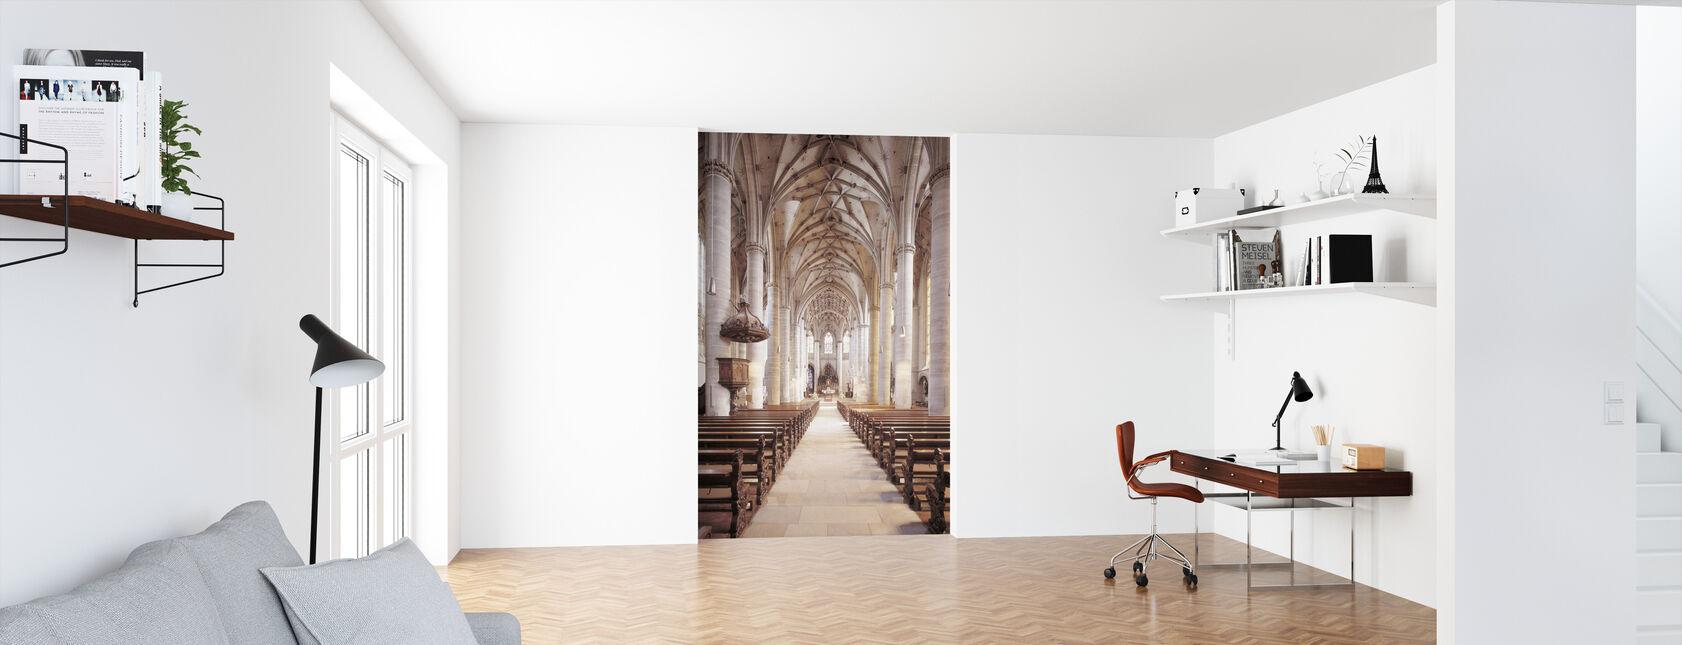 Gmuender Münster - Behang - Kantoor